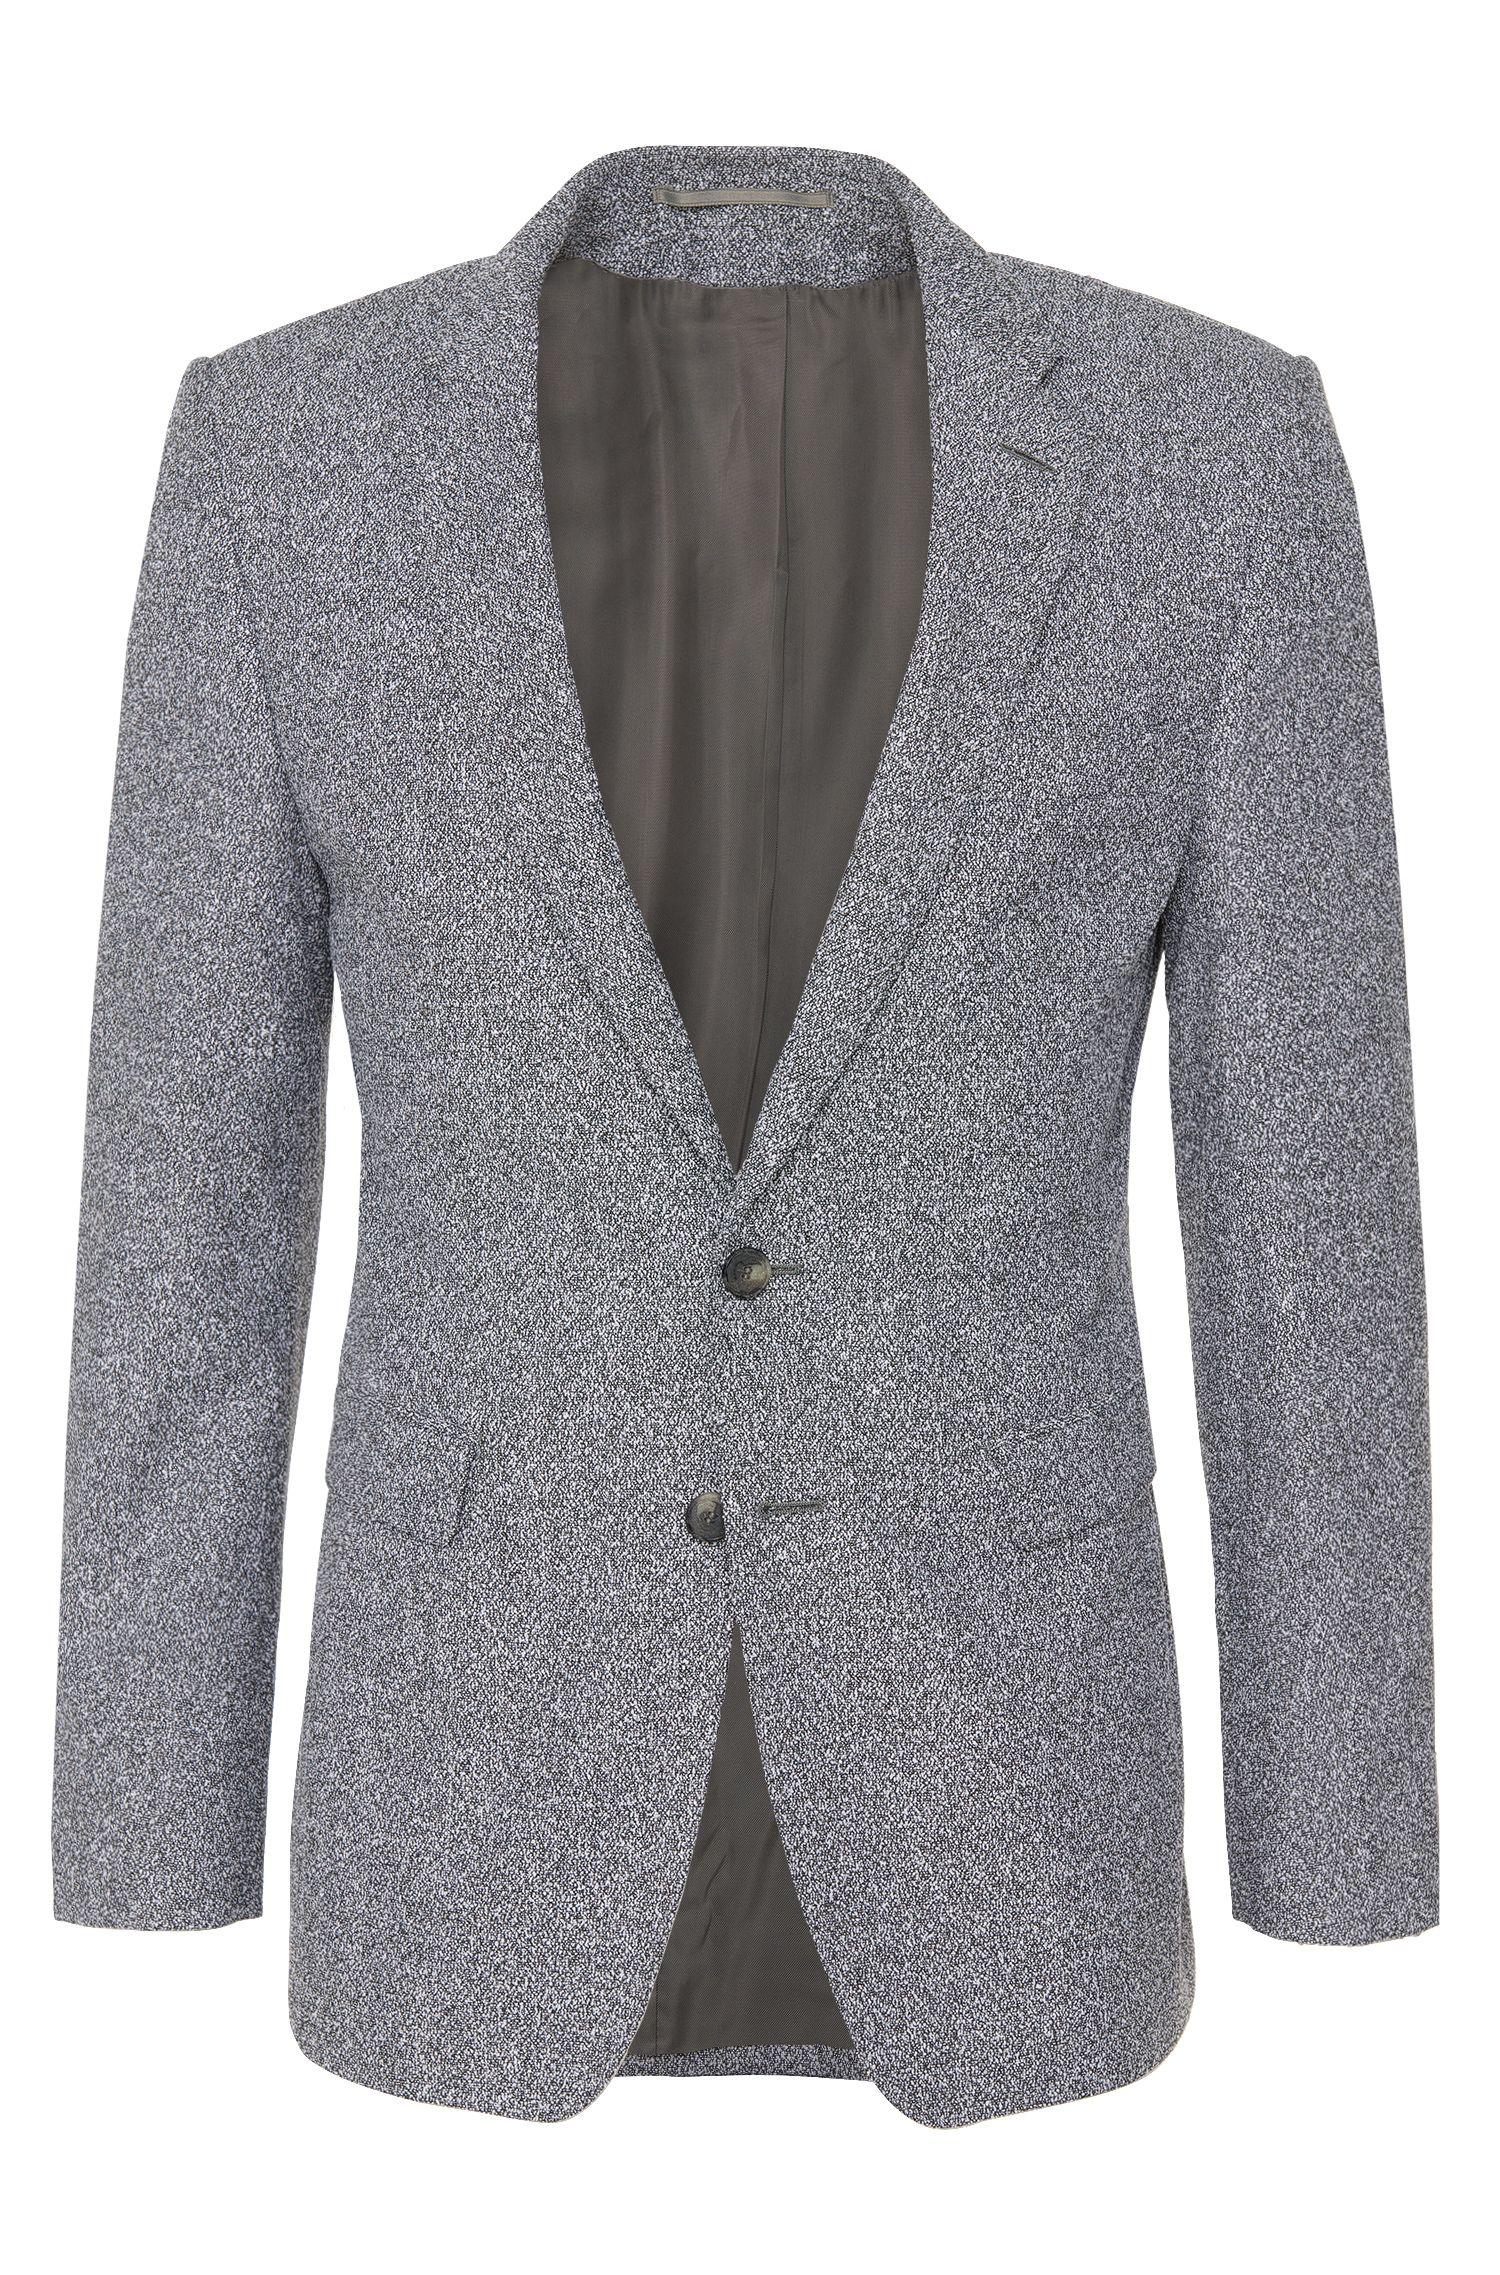 'T-Raven' | Extra Slim Fit, Italian Virgin Wool Cotton Blend Sport Coat